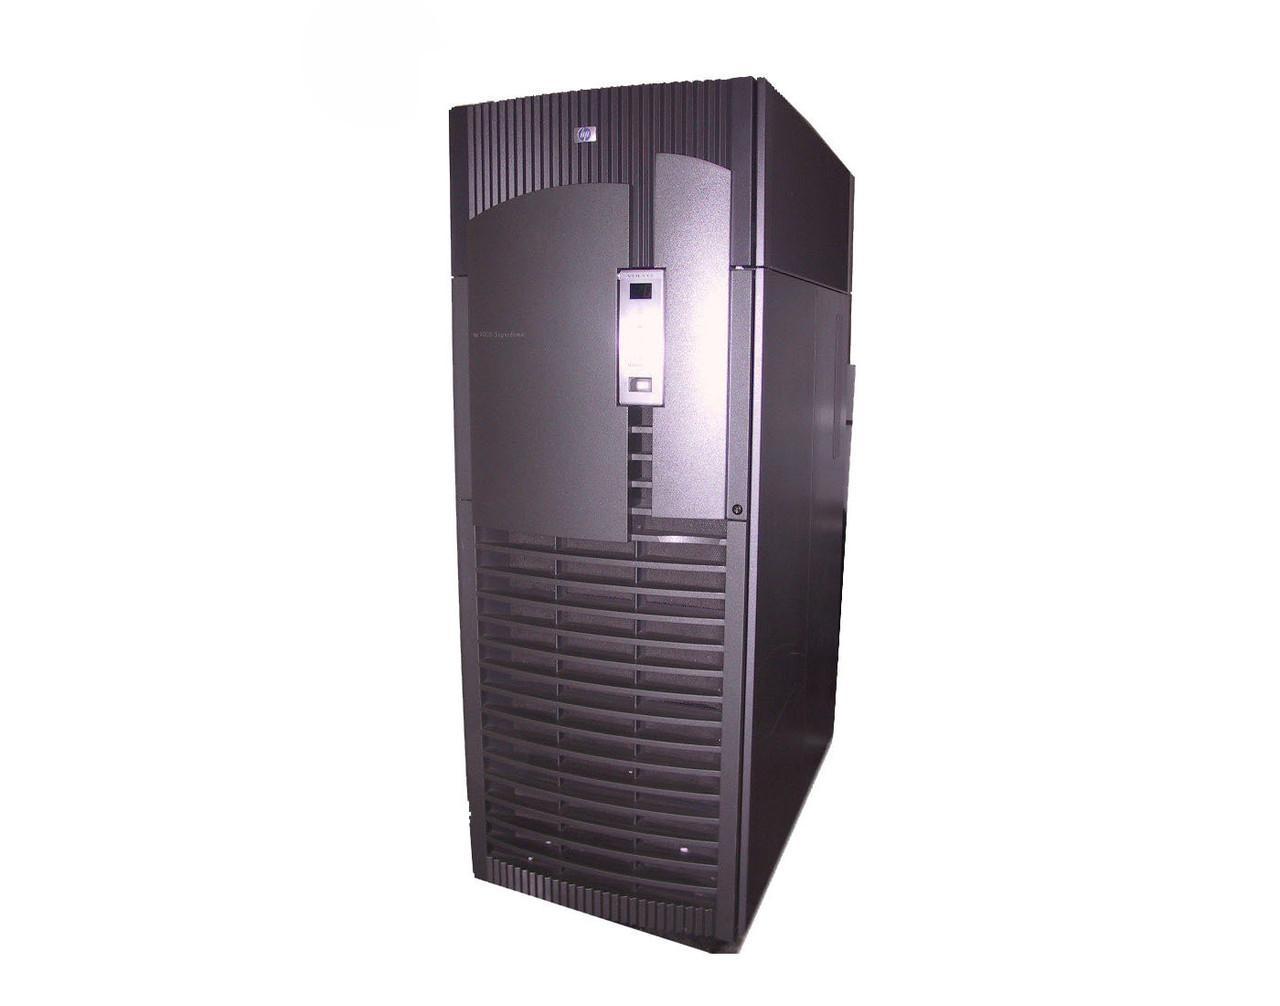 HP 9000 SuperDome Servers